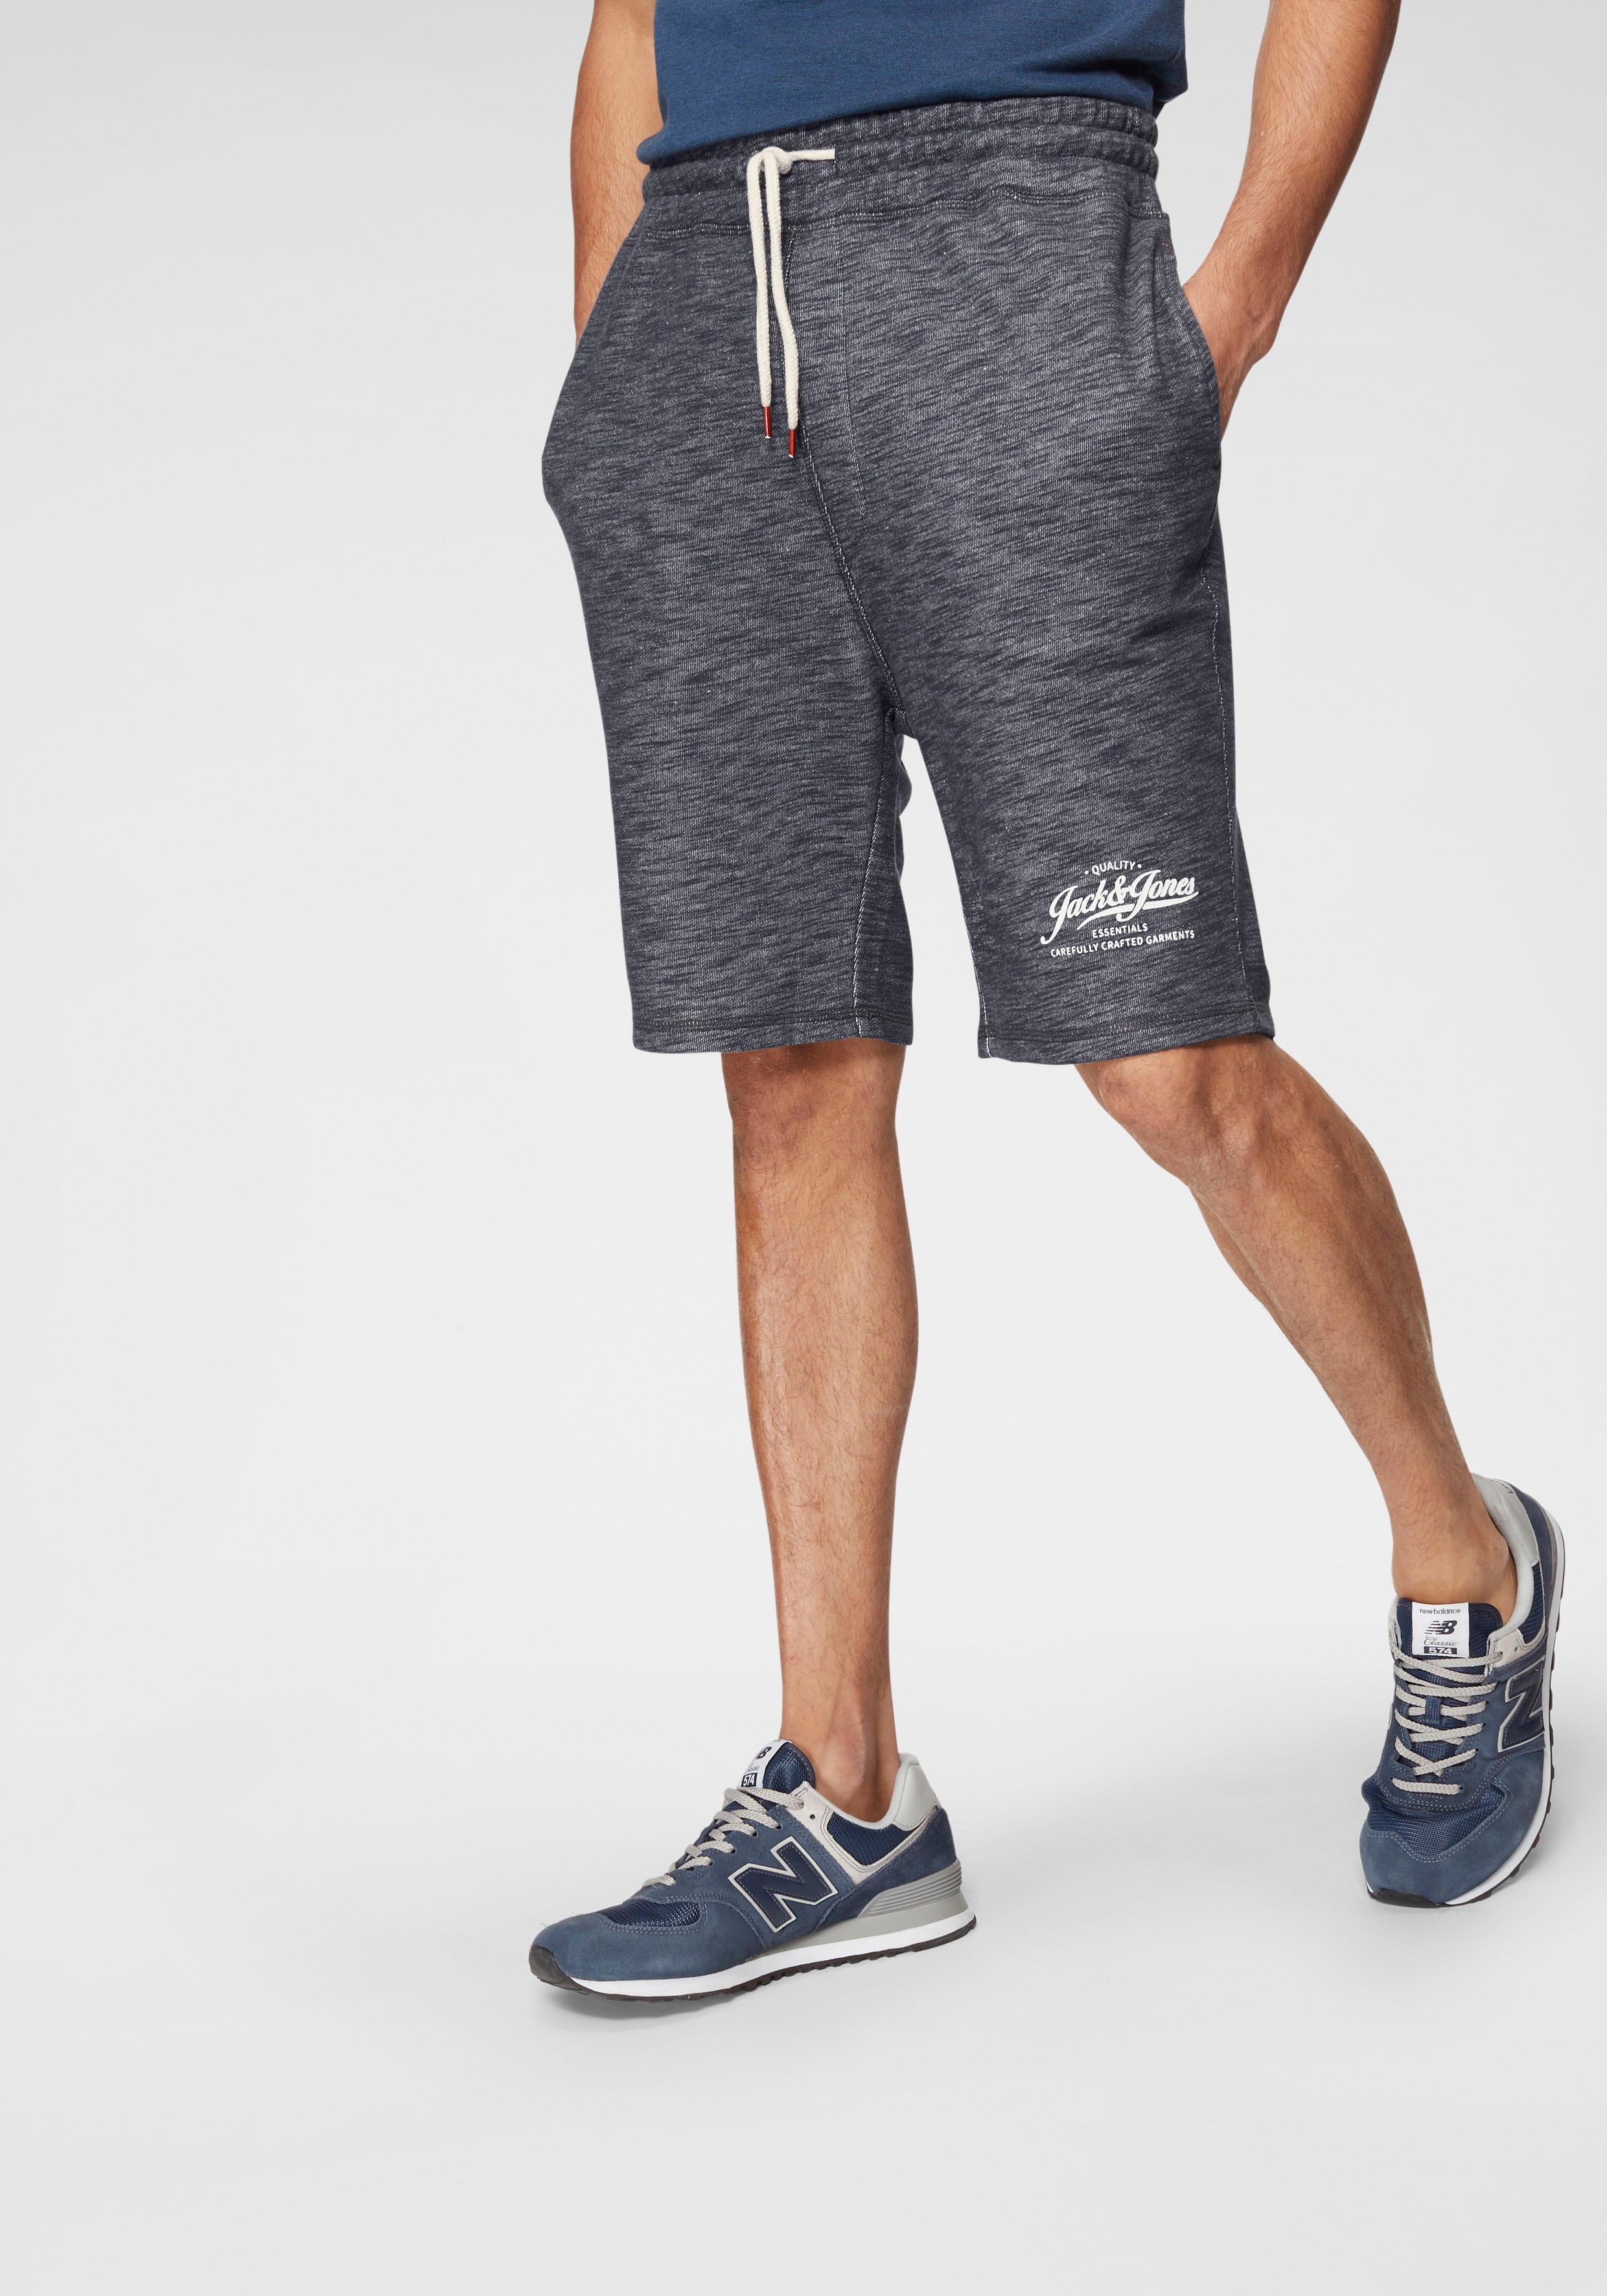 Jack & Jones Shorts | Bekleidung > Shorts & Bermudas > Shorts | Blau | Jack & Jones